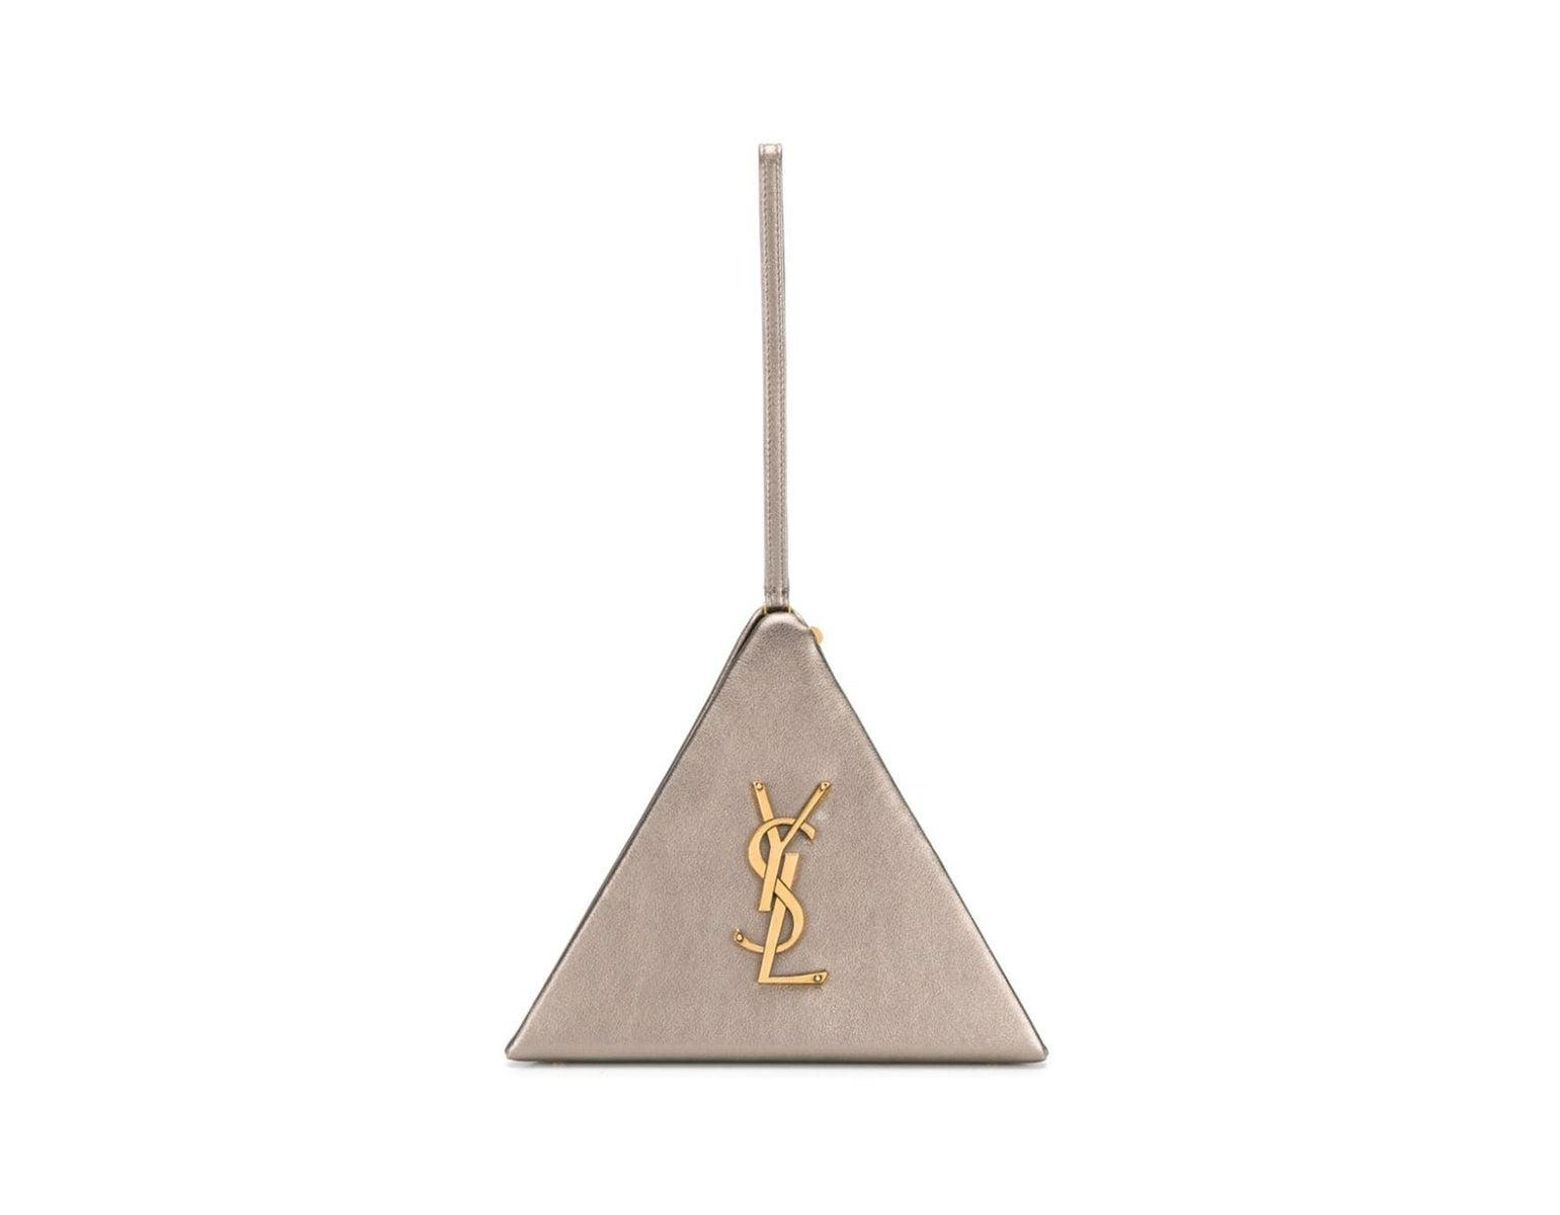 4d18c2b64b Saint Laurent Ysl Pyramid Metallic Hand Bag Grey in Gray - Lyst